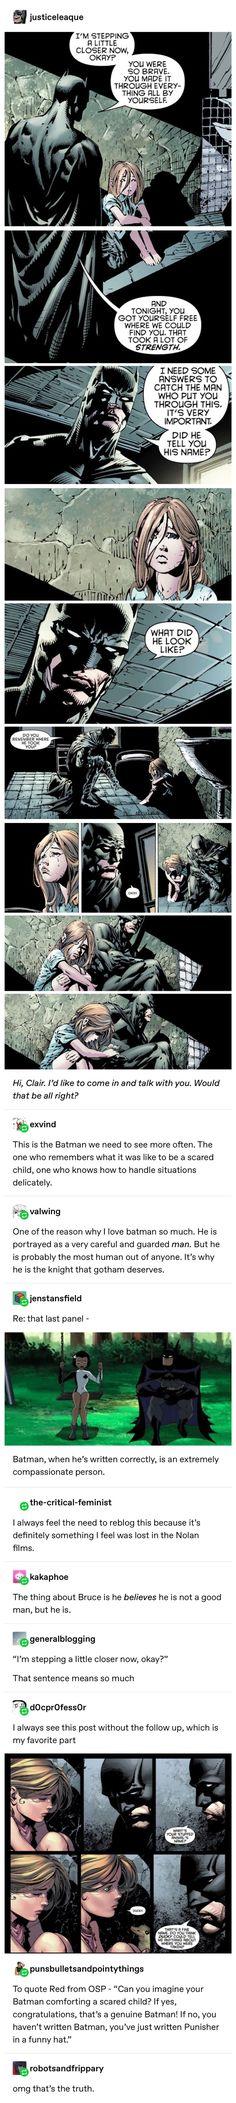 Batman comic strips Punisher quotes Bruce Wayne superheroes DCAU animation animated series show Child children comforting Dc Comics, Batman Comics, Fandoms, Xmen, Nananana Batman, Hq Dc, What Is Digital, Im Batman, Superman